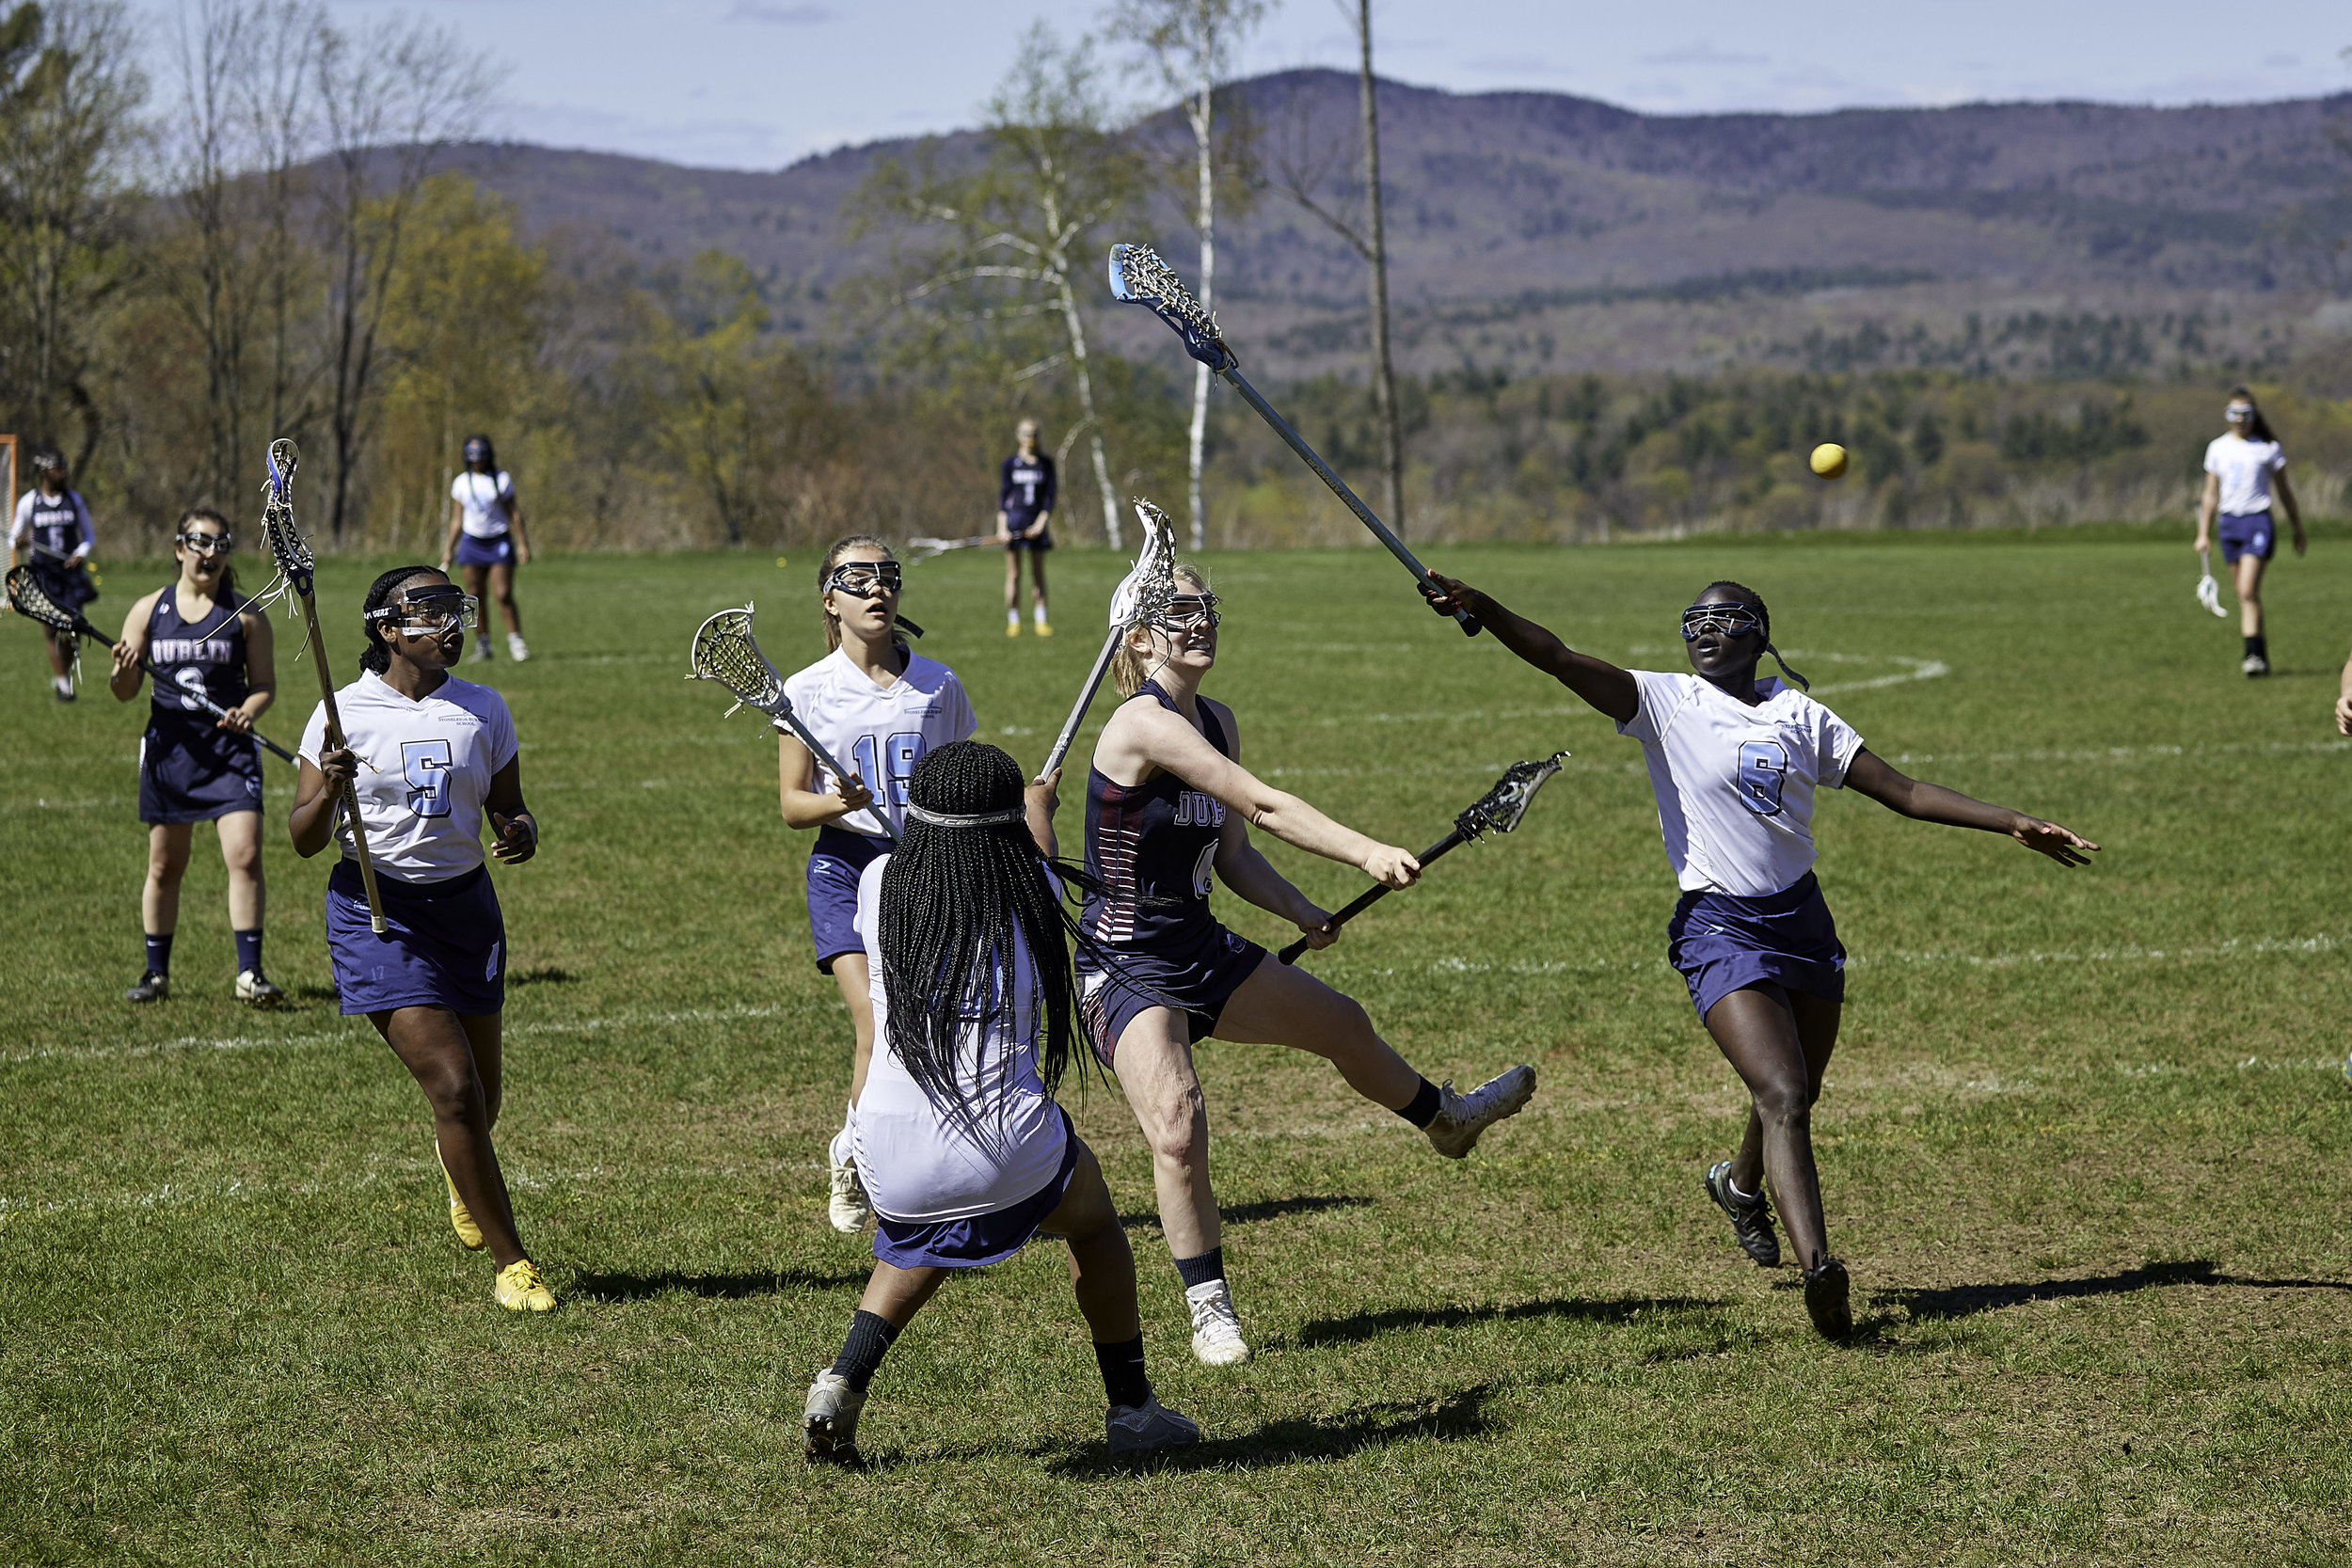 Girls Lacrosse vs. Stoneleigh Burnham School - May 11, 2019 - May 10, 2019193429.jpg